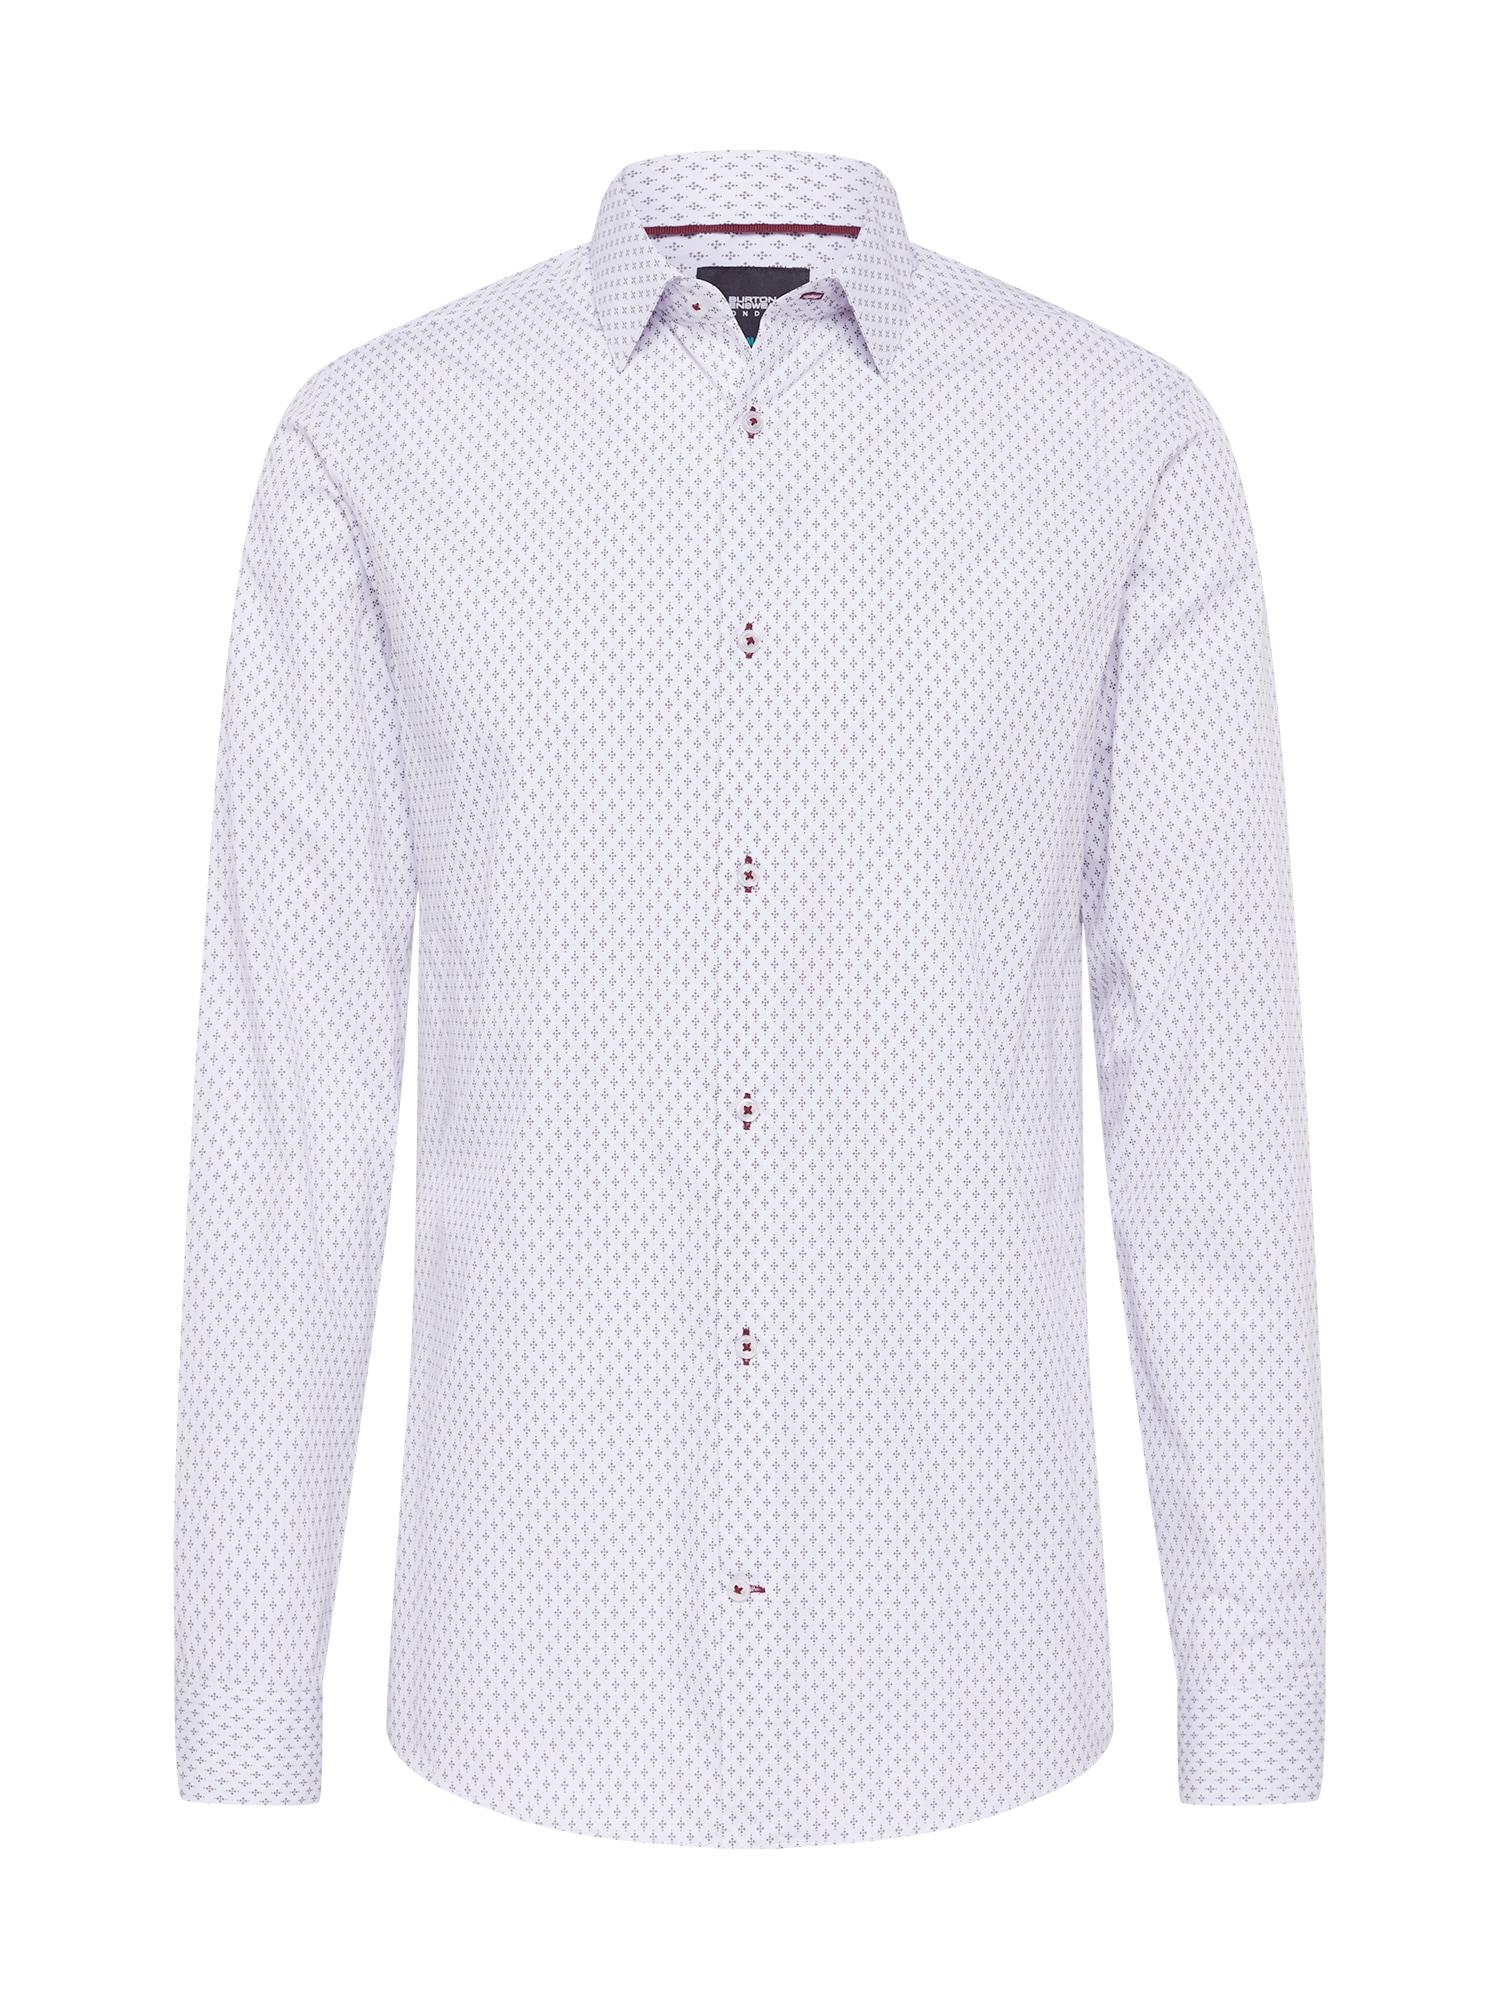 BURTON MENSWEAR LONDON (Big & Tall) Marškiniai balta / pilka